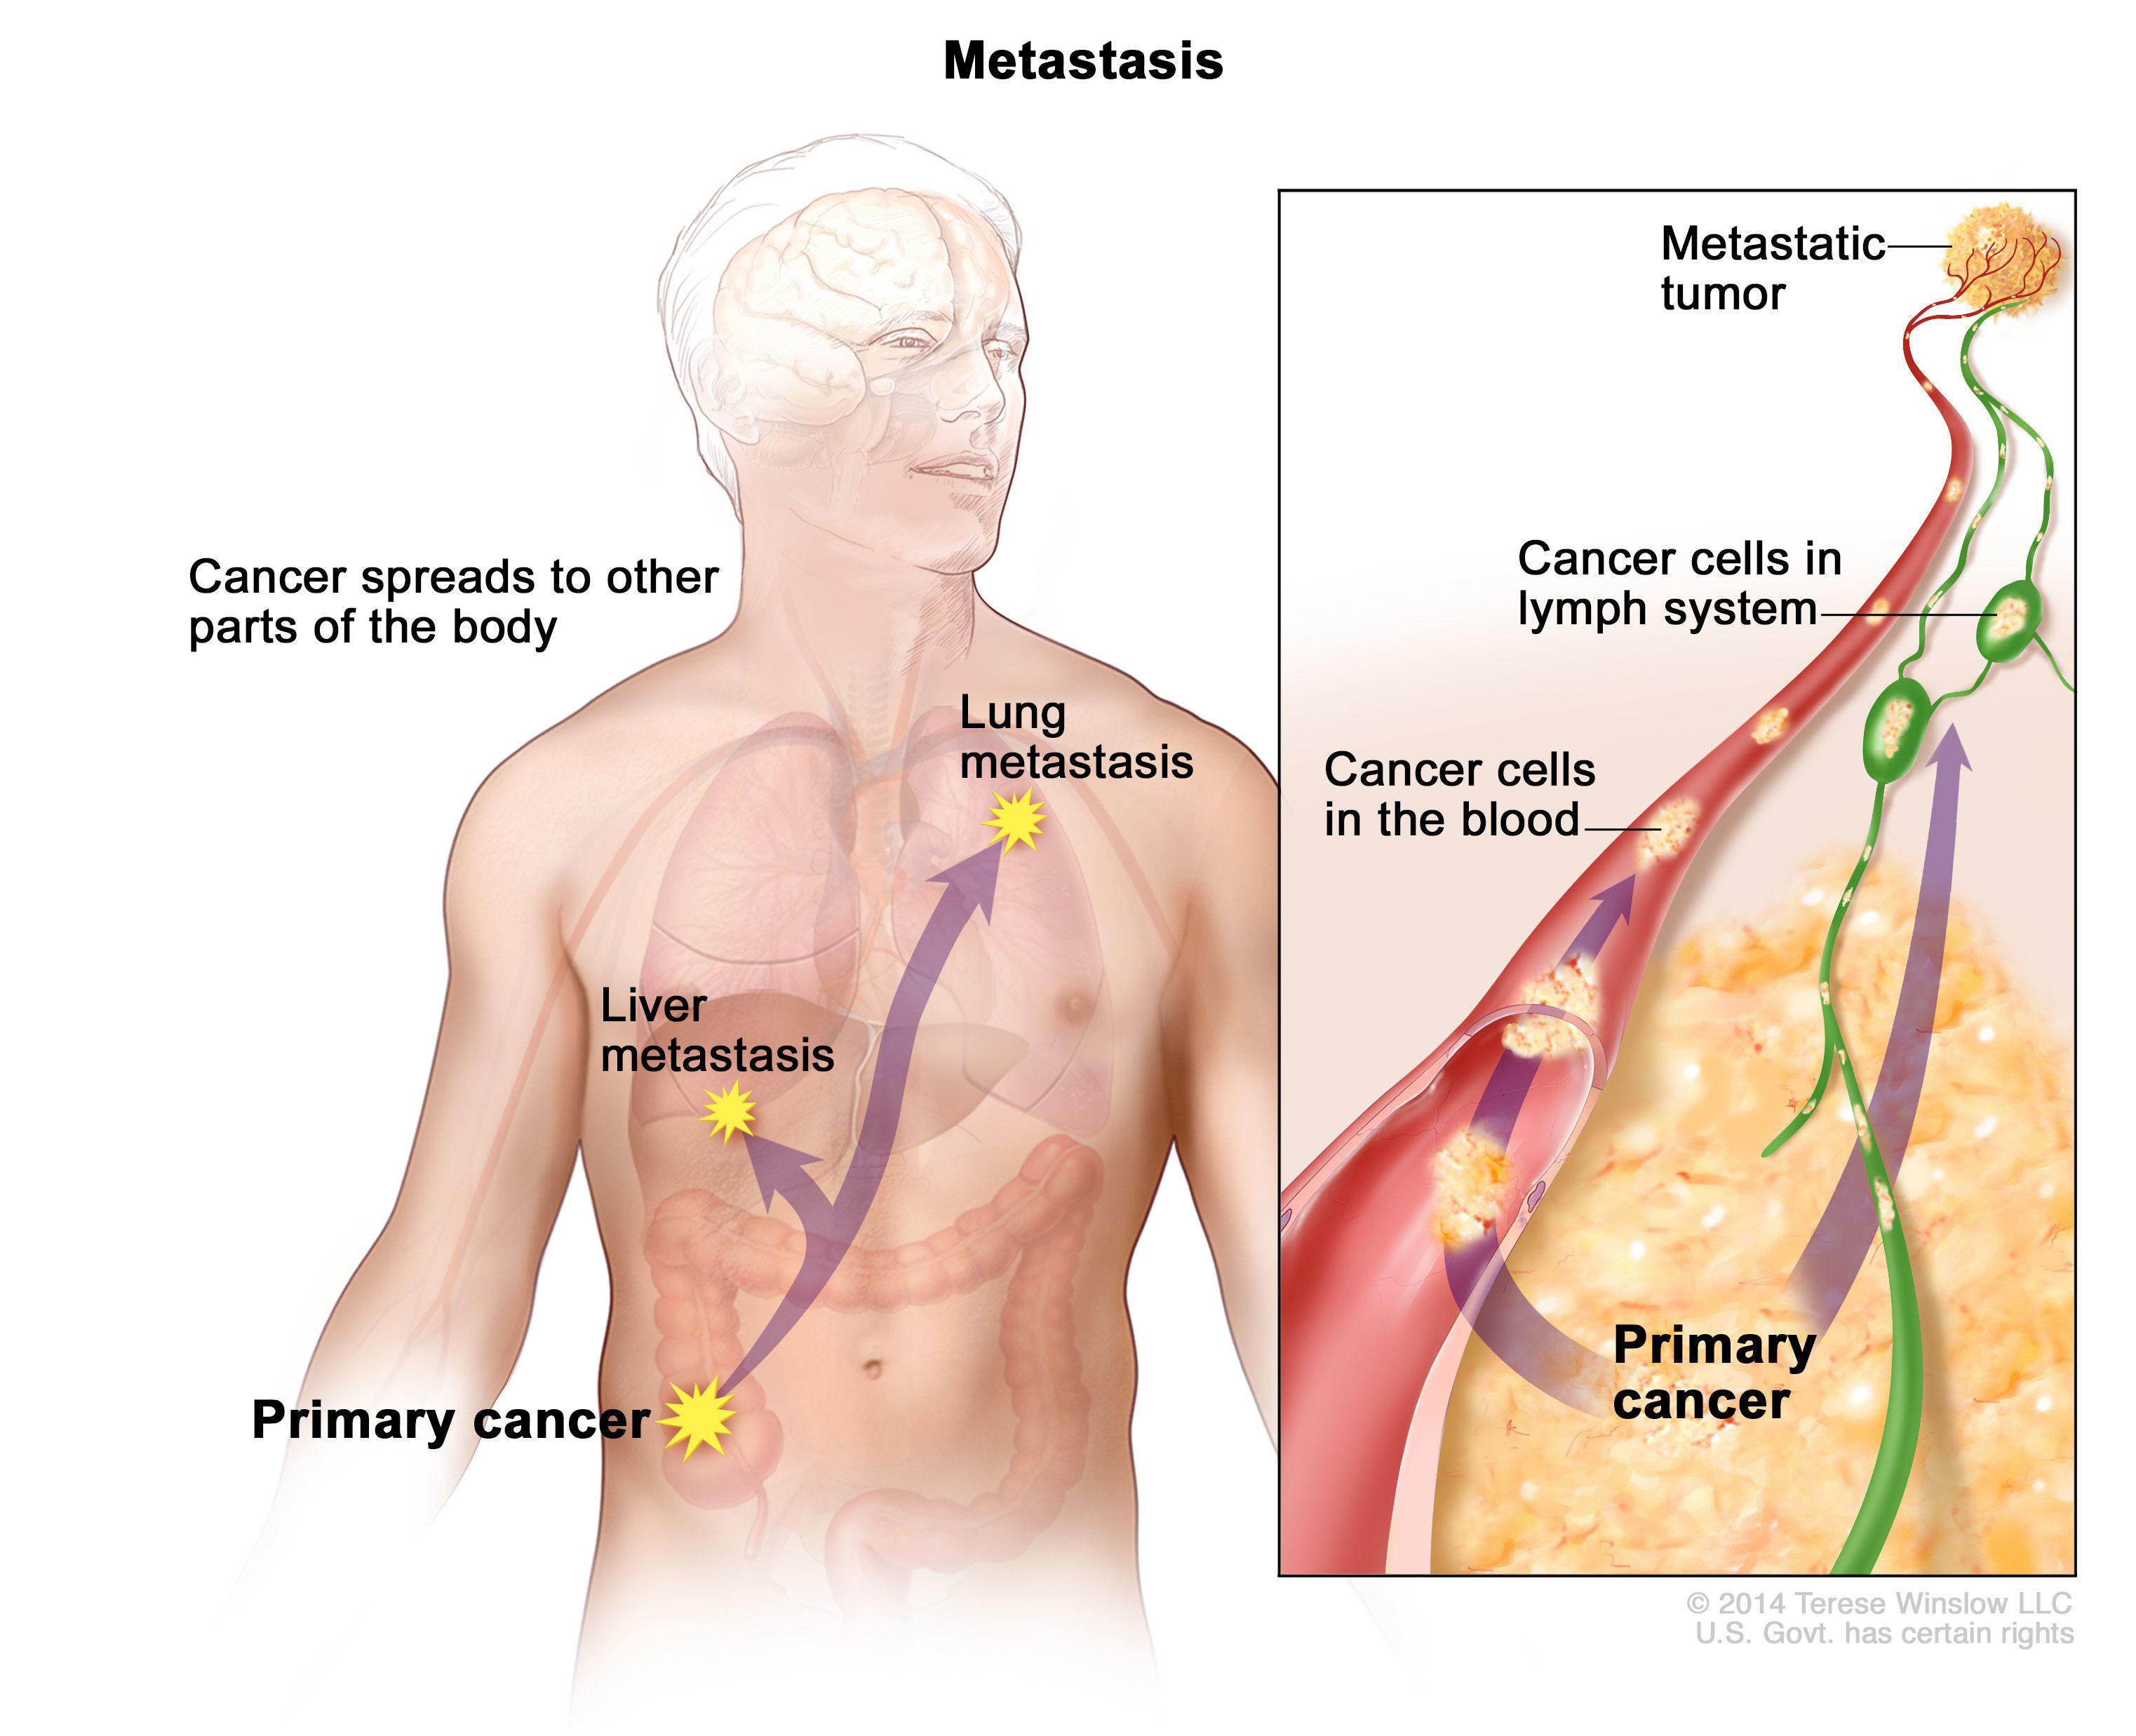 metastatic cancer carcinoma